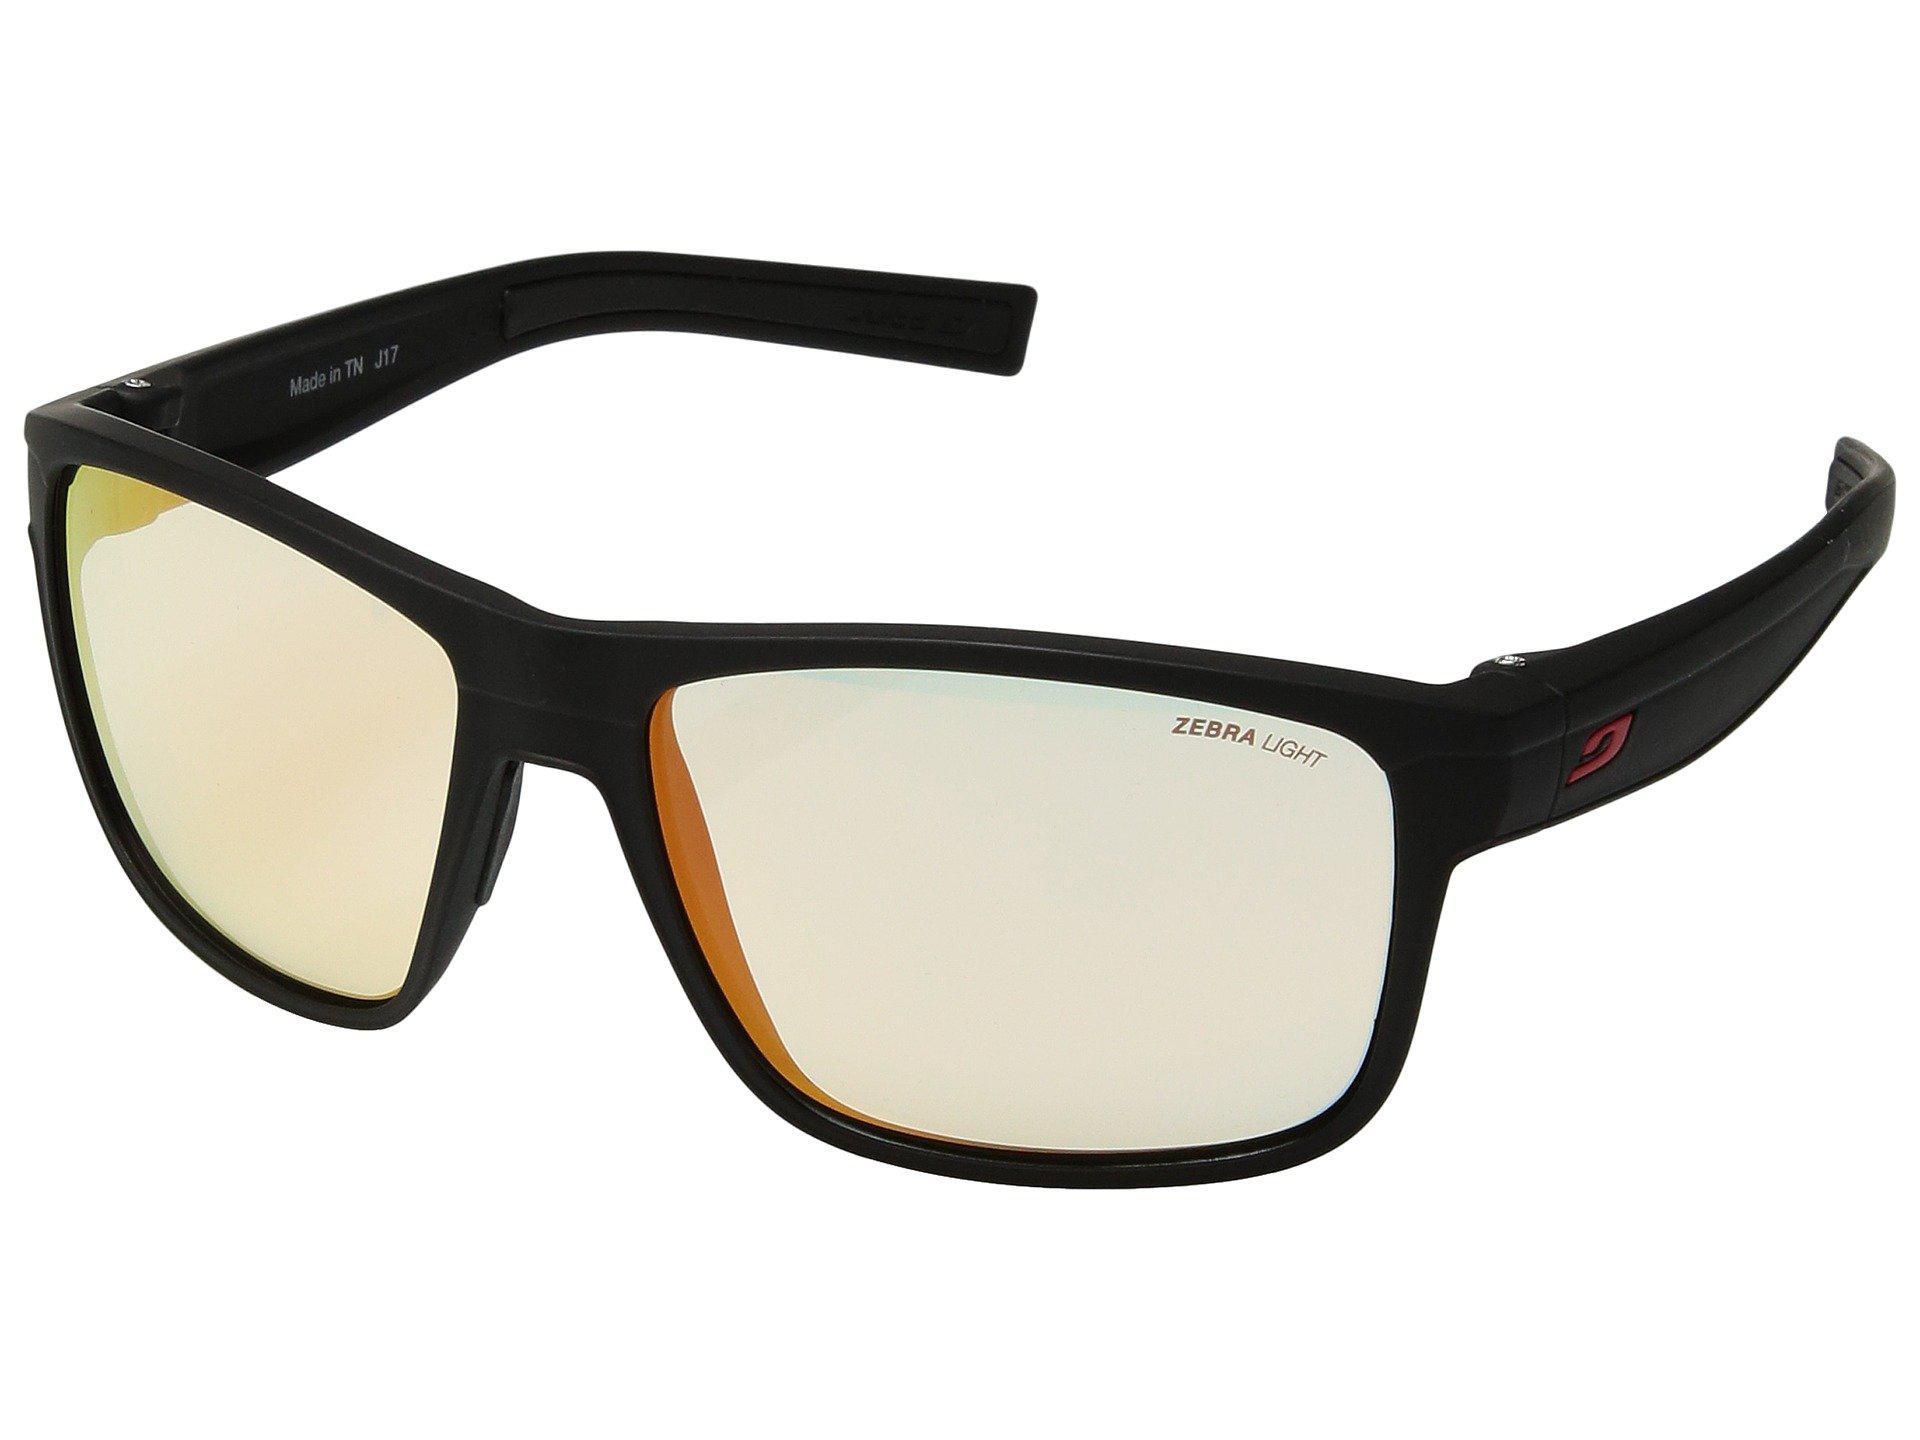 3723e8b1ff Julbo Eyewear. Men s Renegade (matte Black black) Athletic Performance  Sport Sunglasses